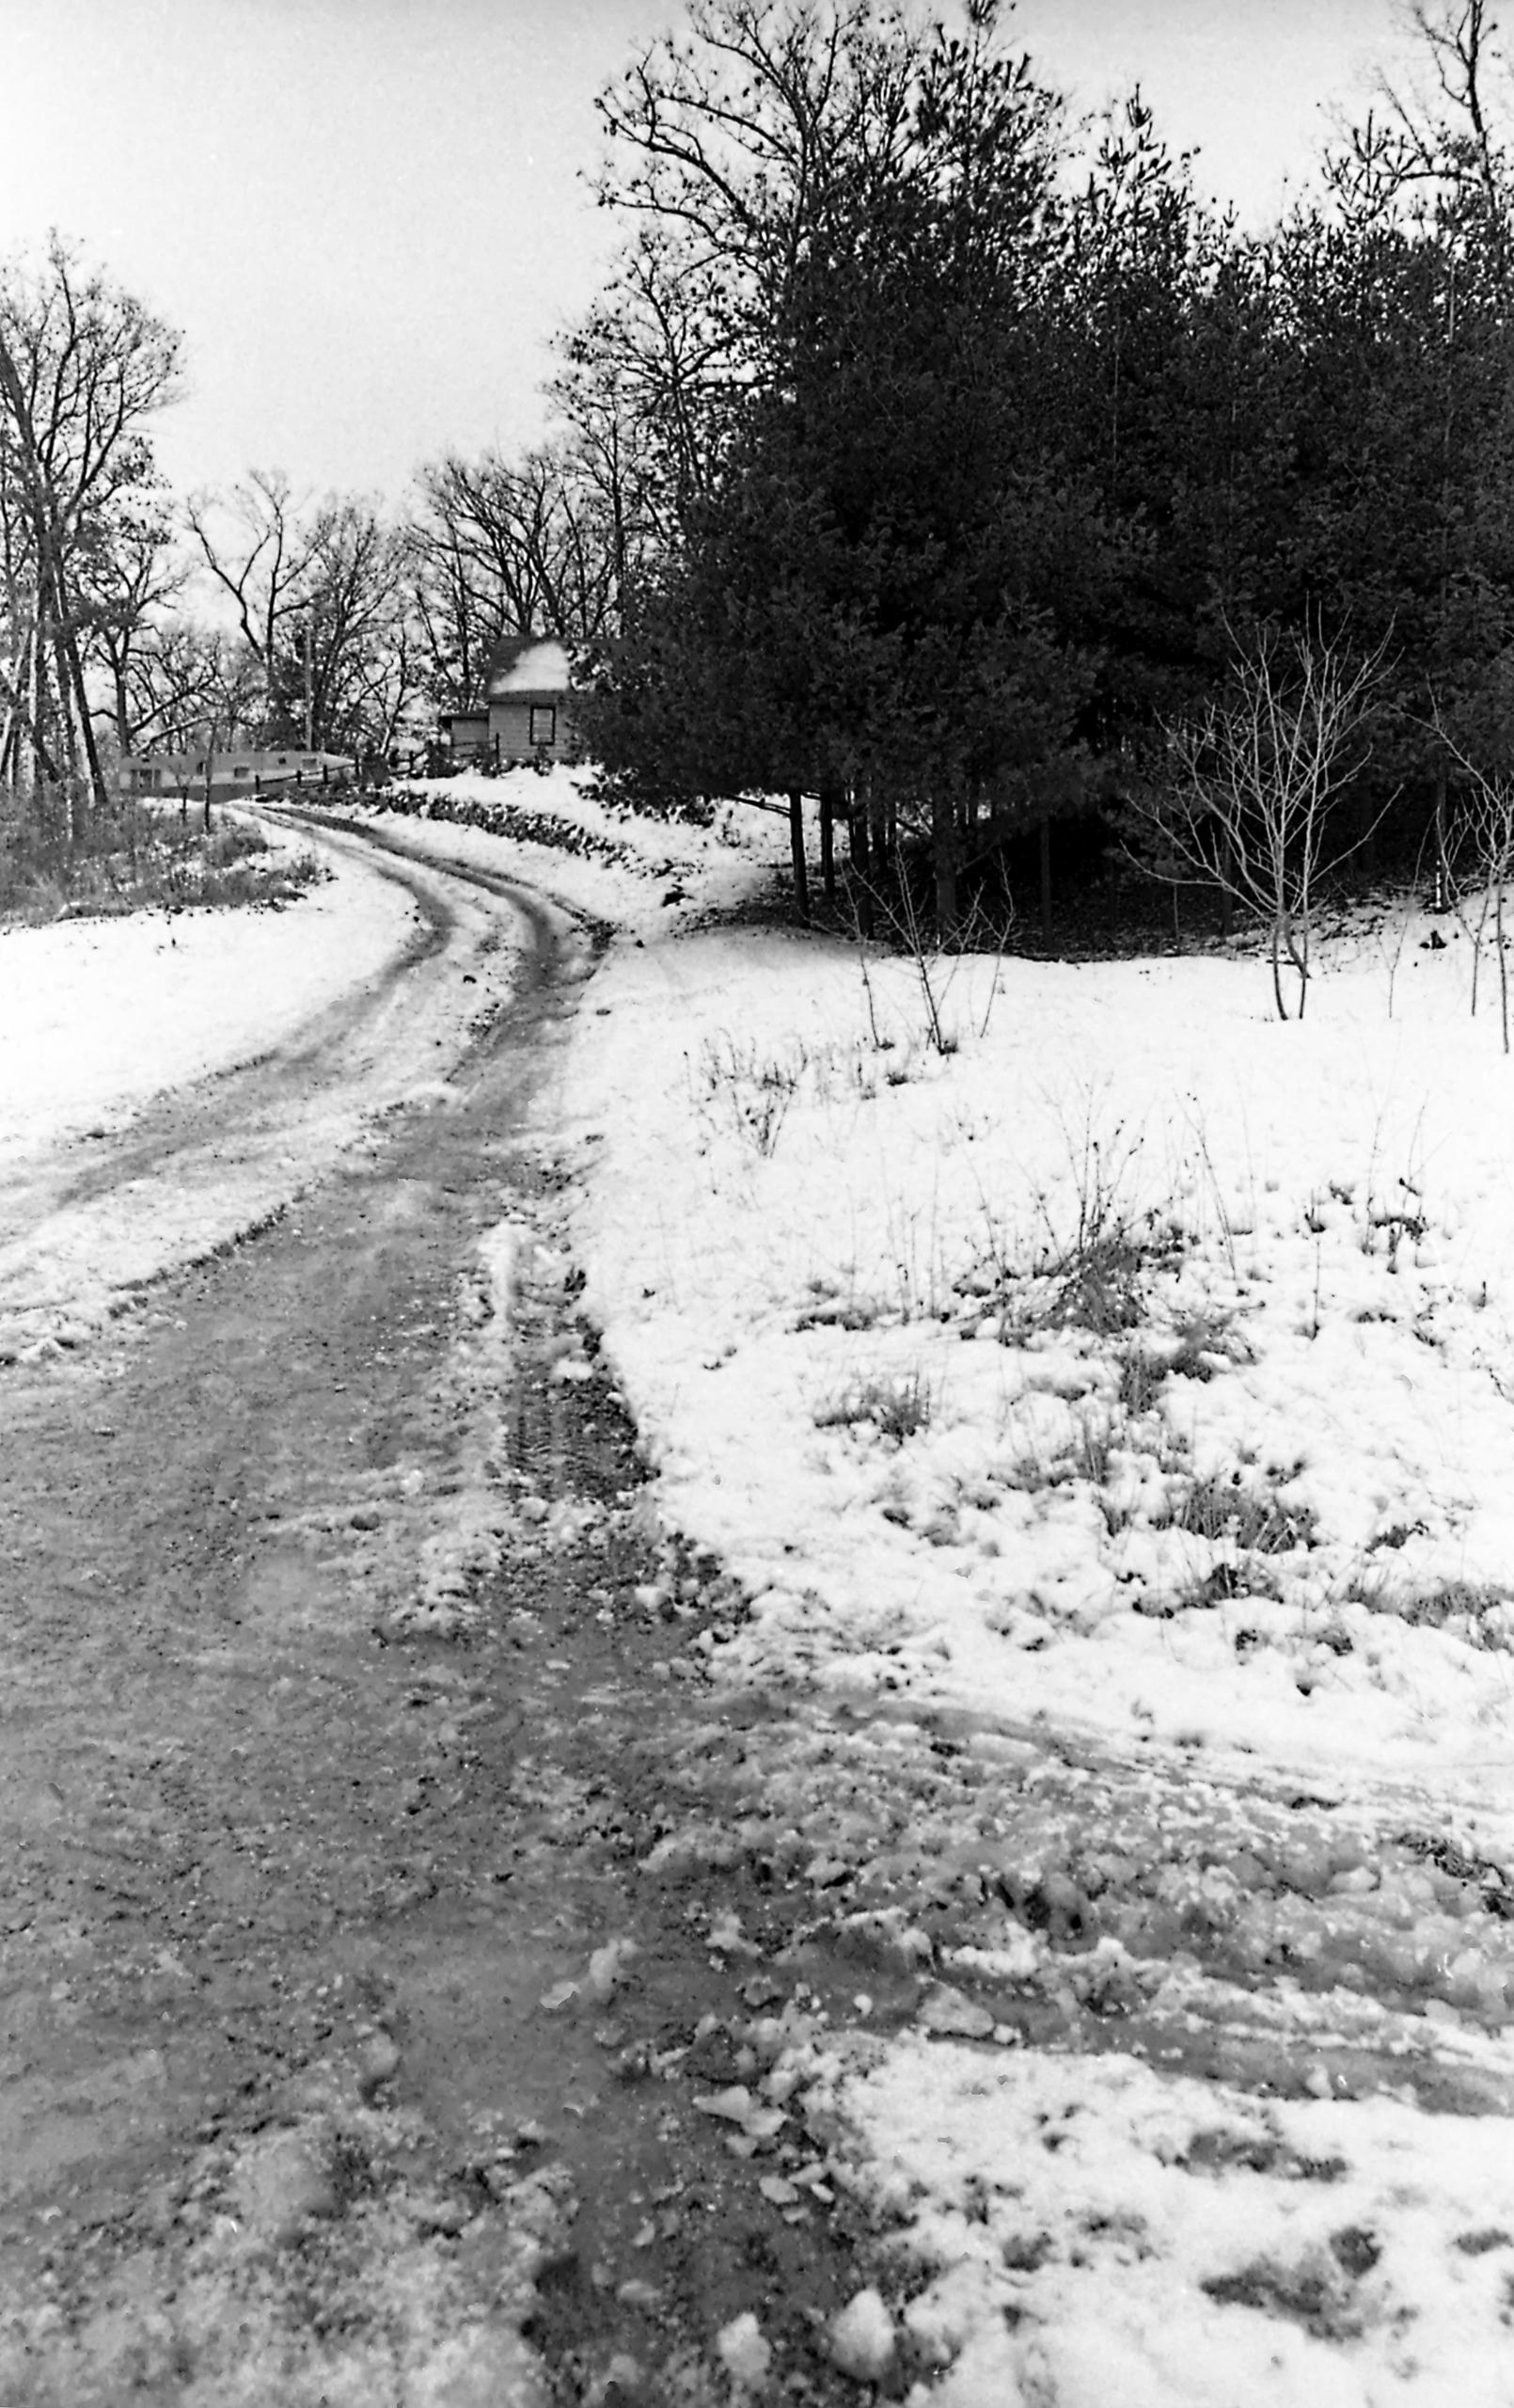 Country roads - capnvideo   ello